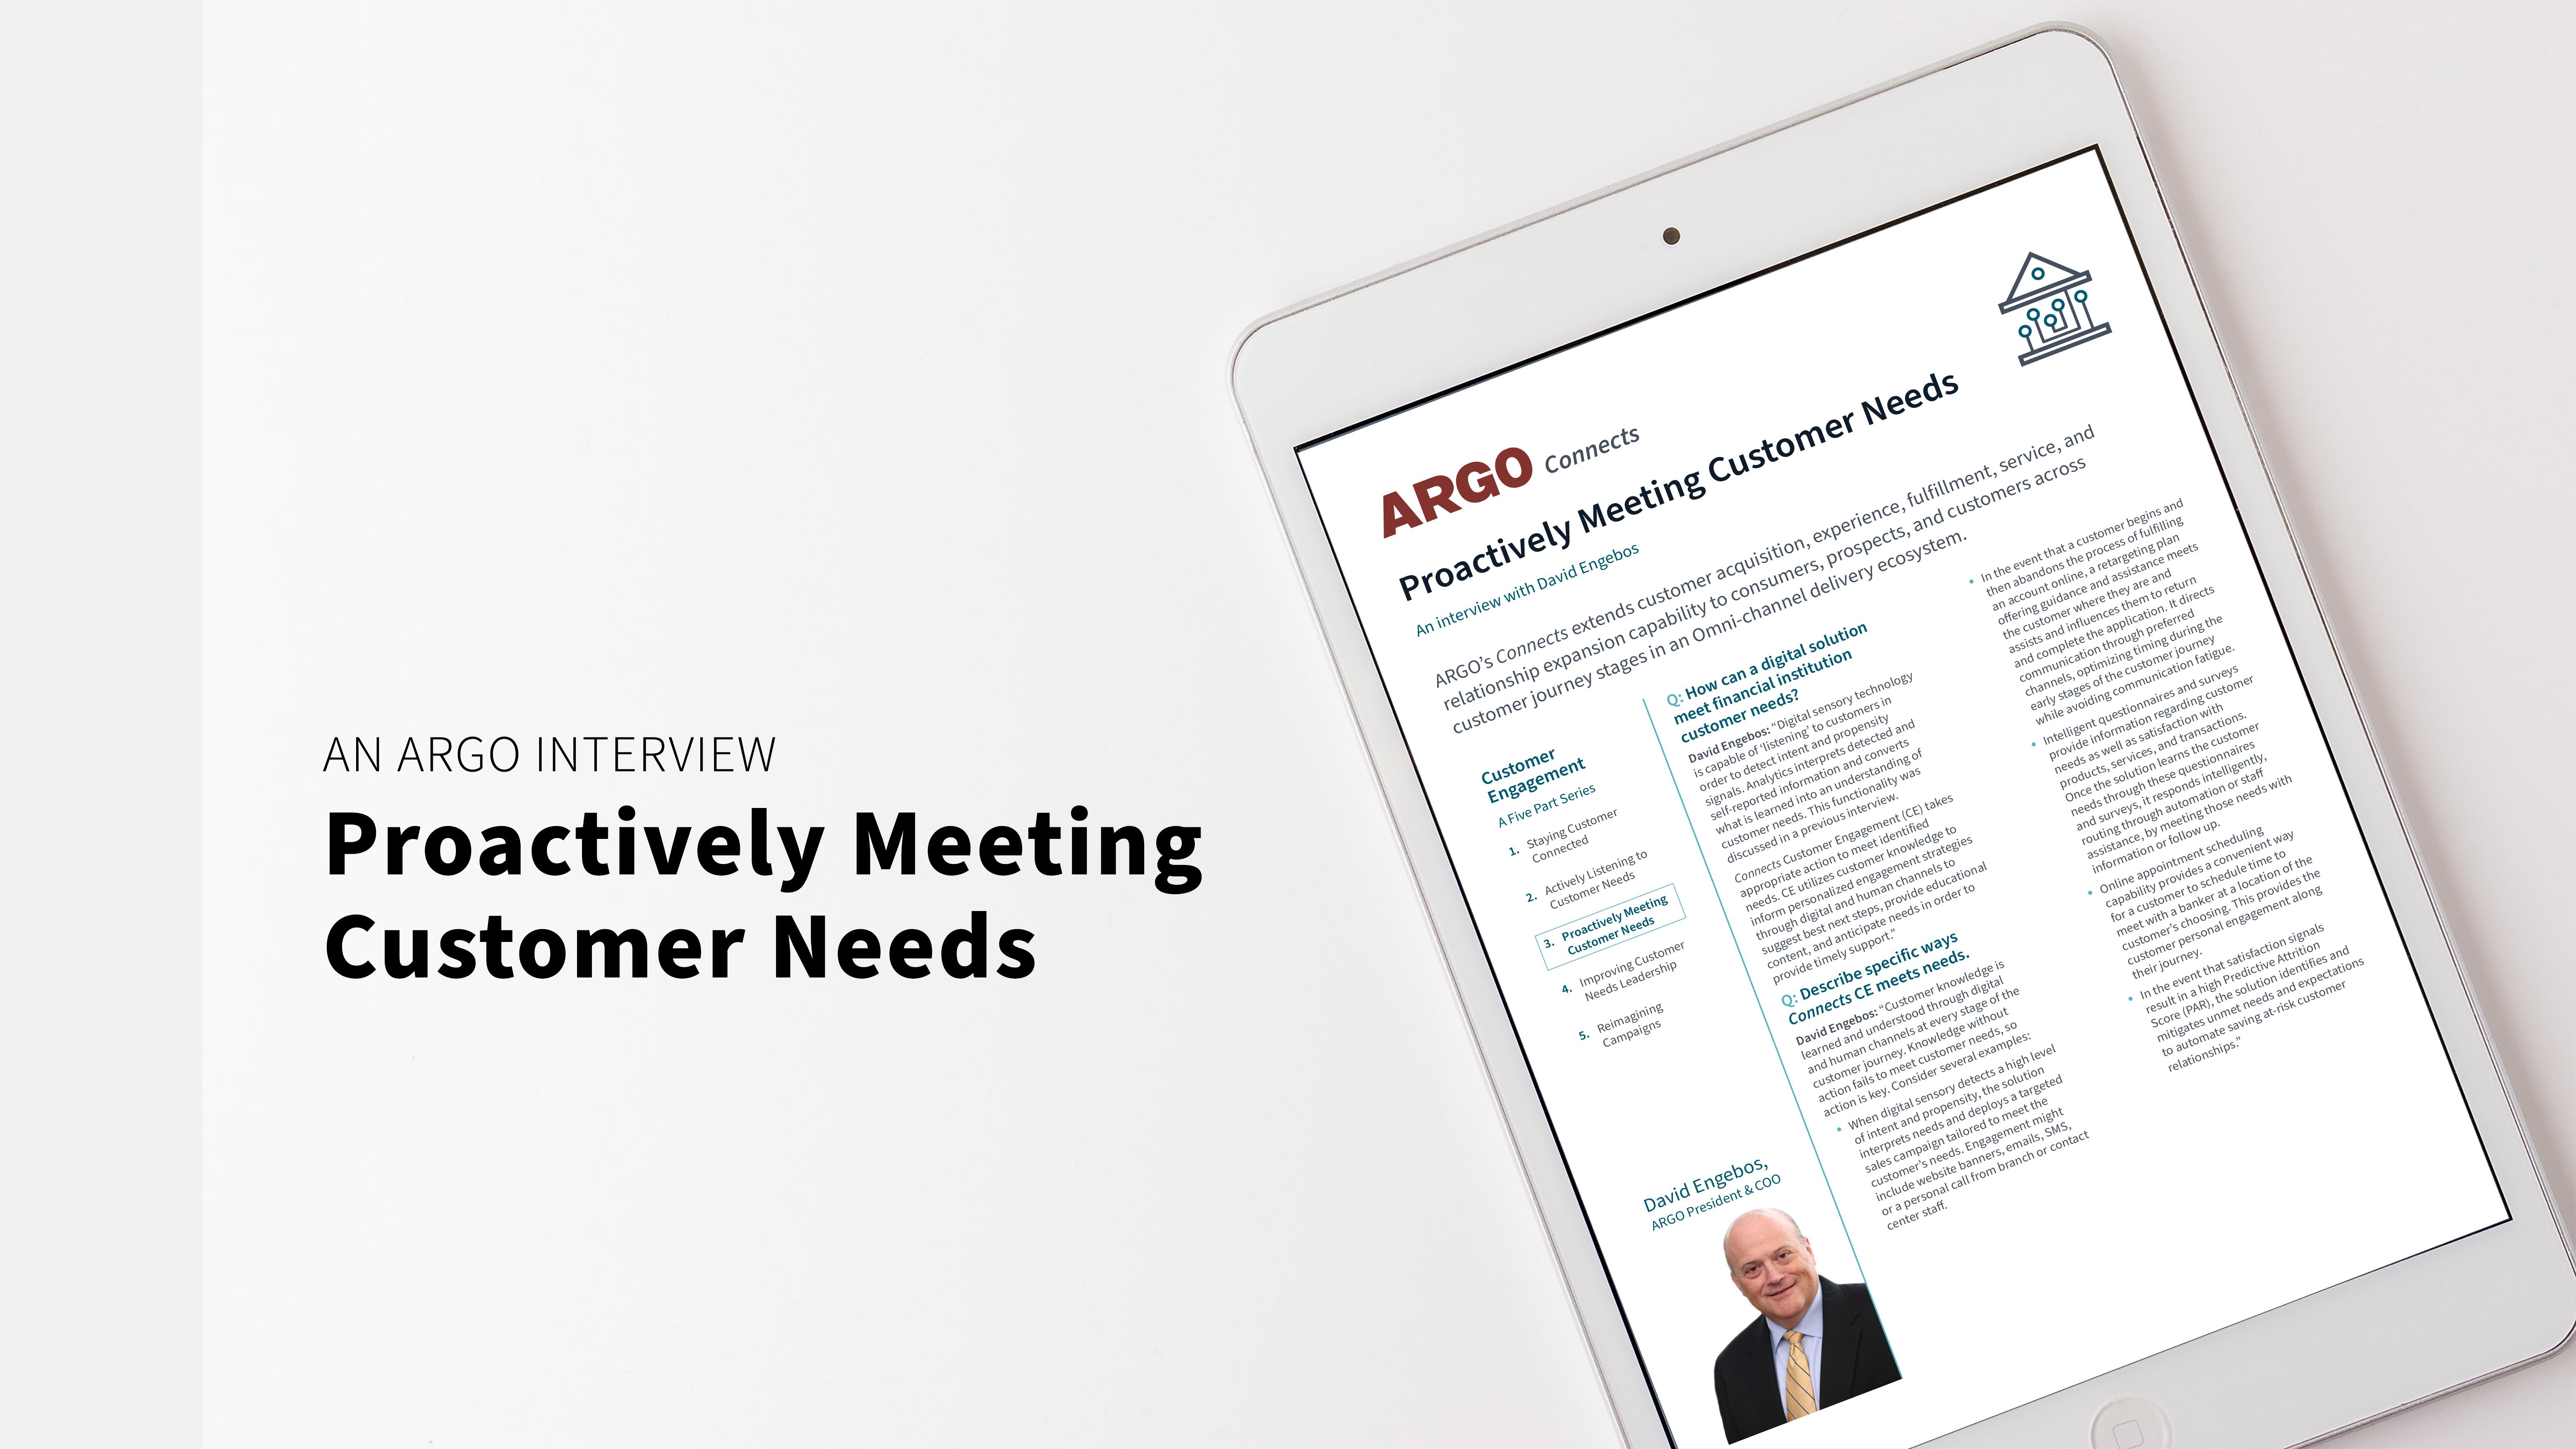 Proactively Meeting Customer Needs[28]